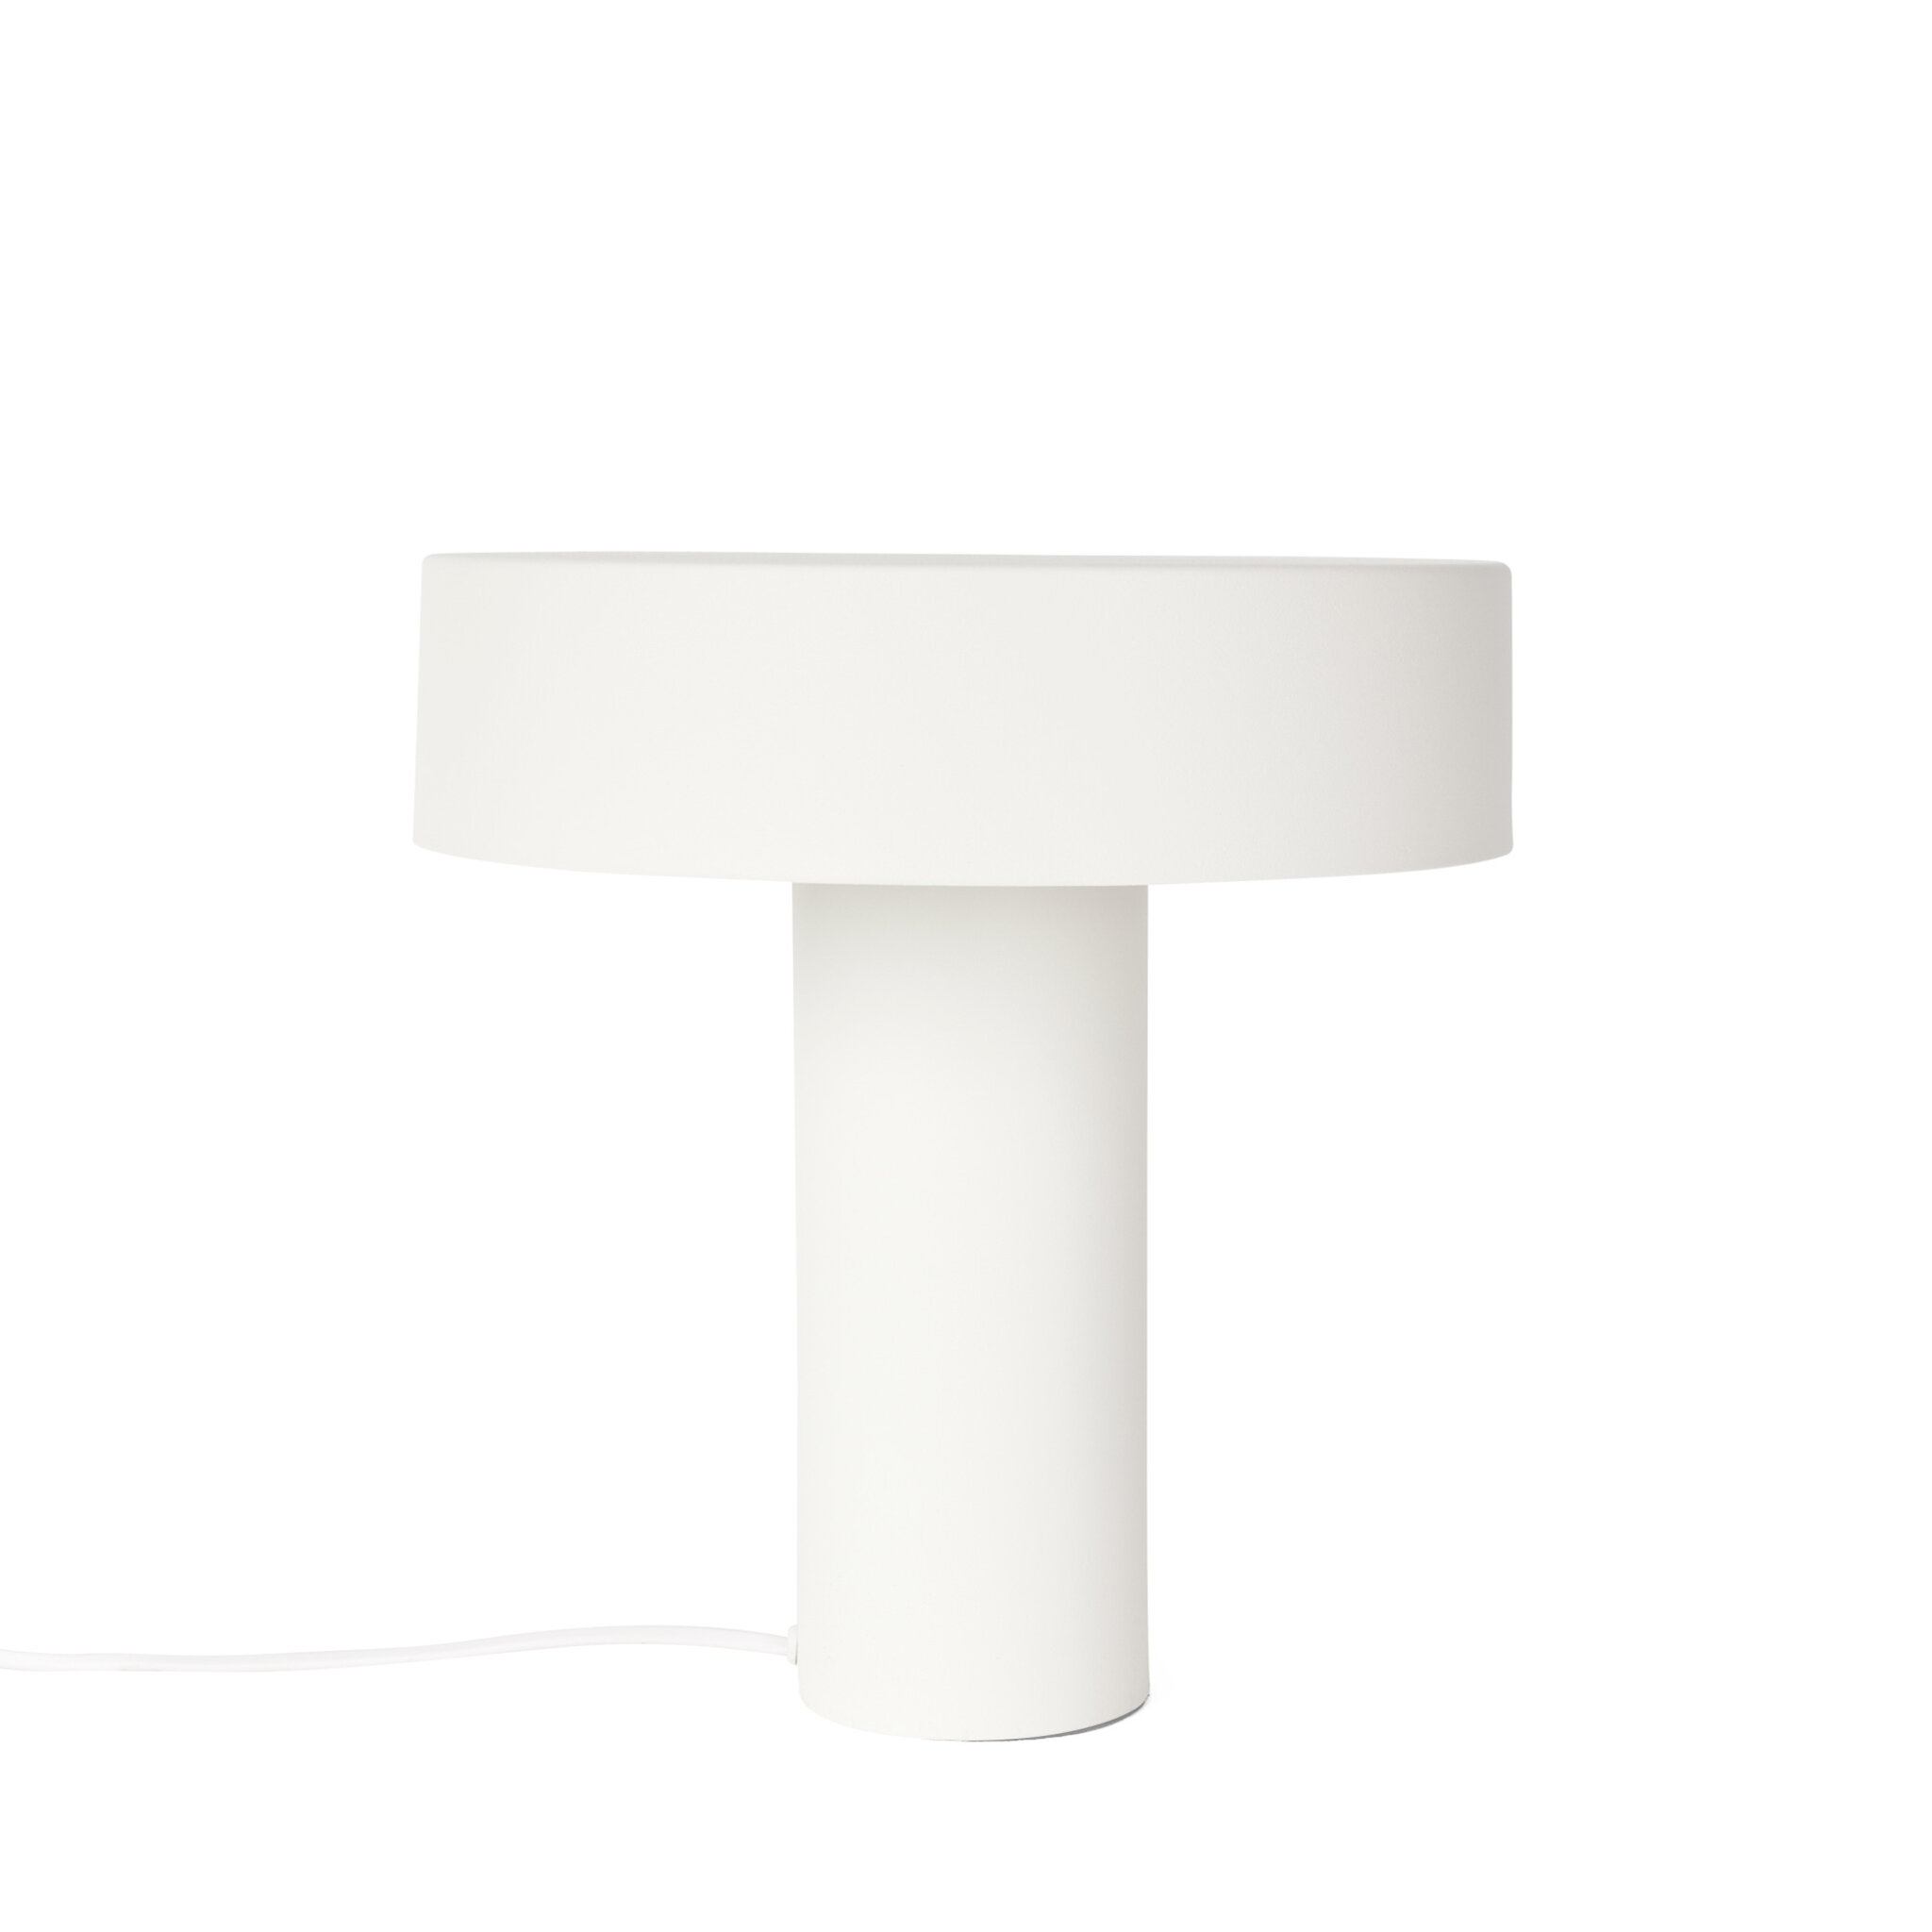 Bordslampa Thea 30 cm, offwhite